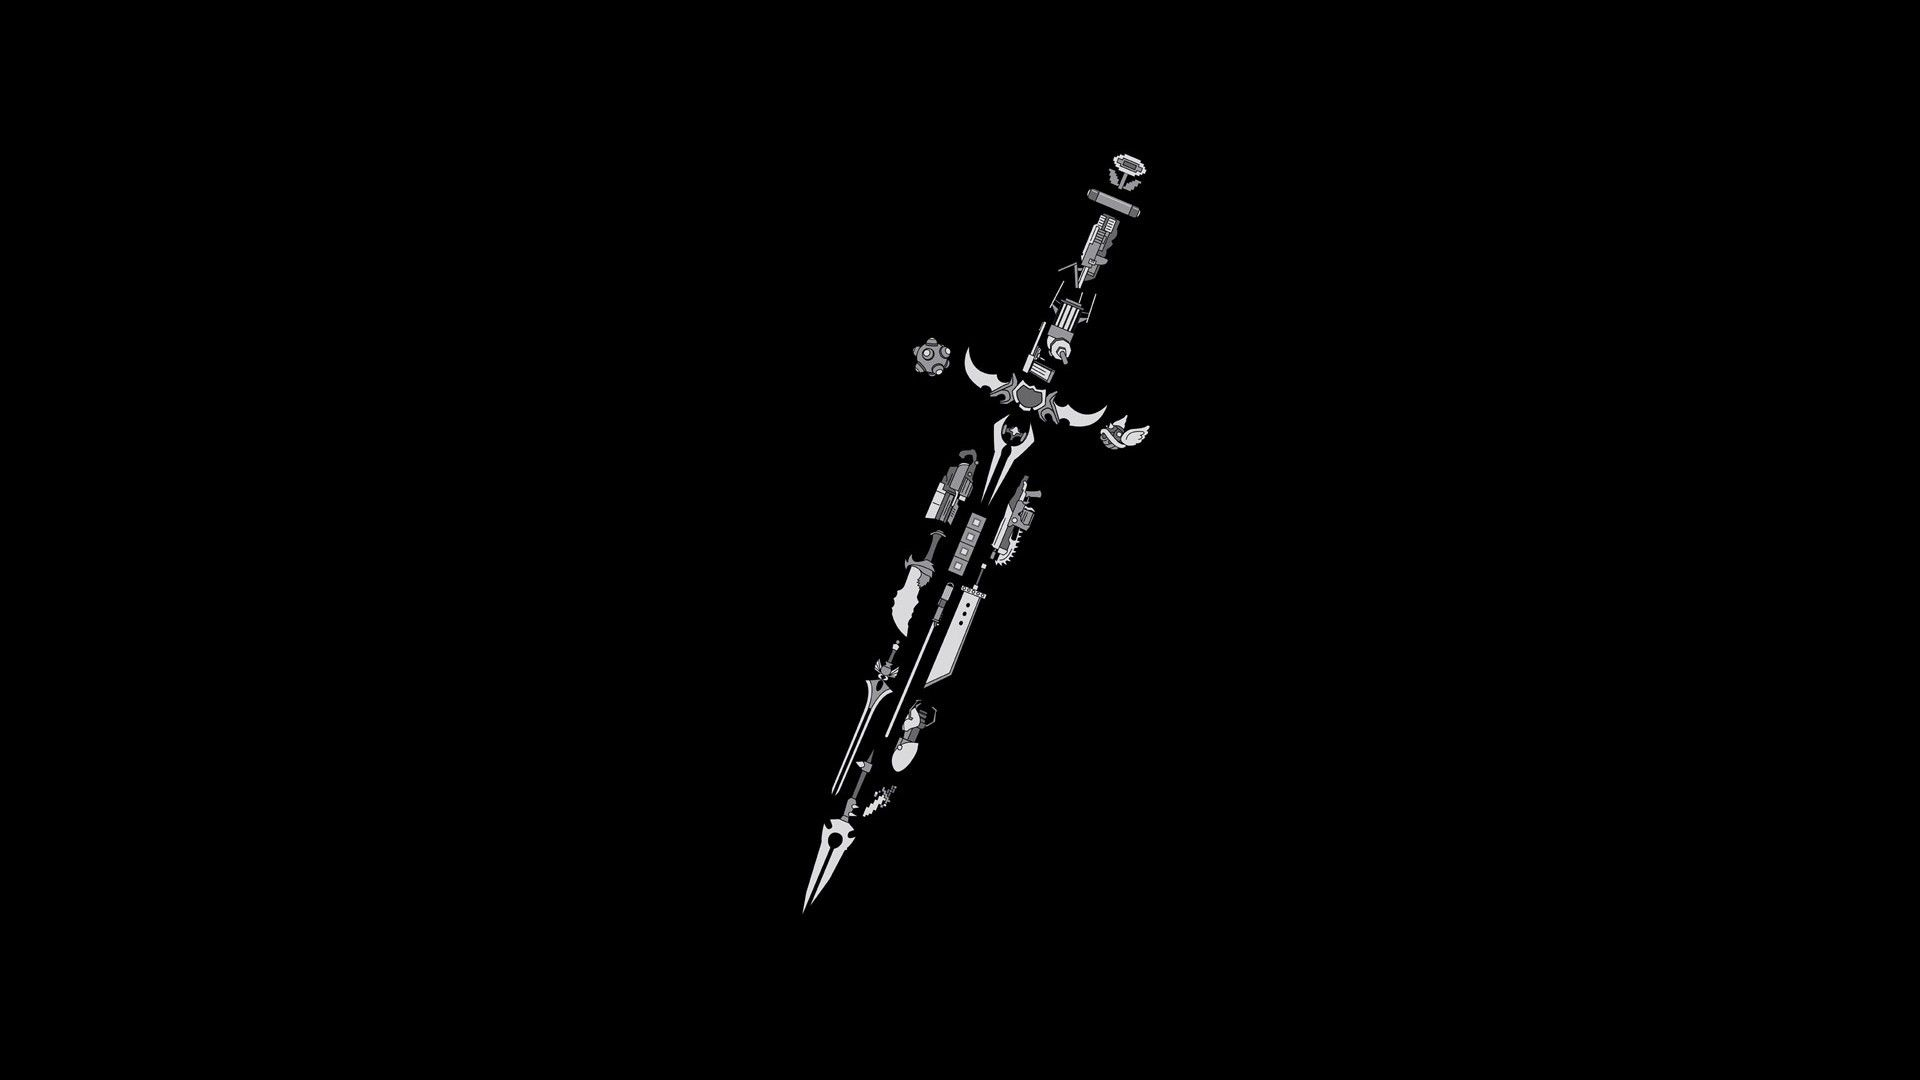 swords wallpapers hd final fantasy sword vector hd | armors